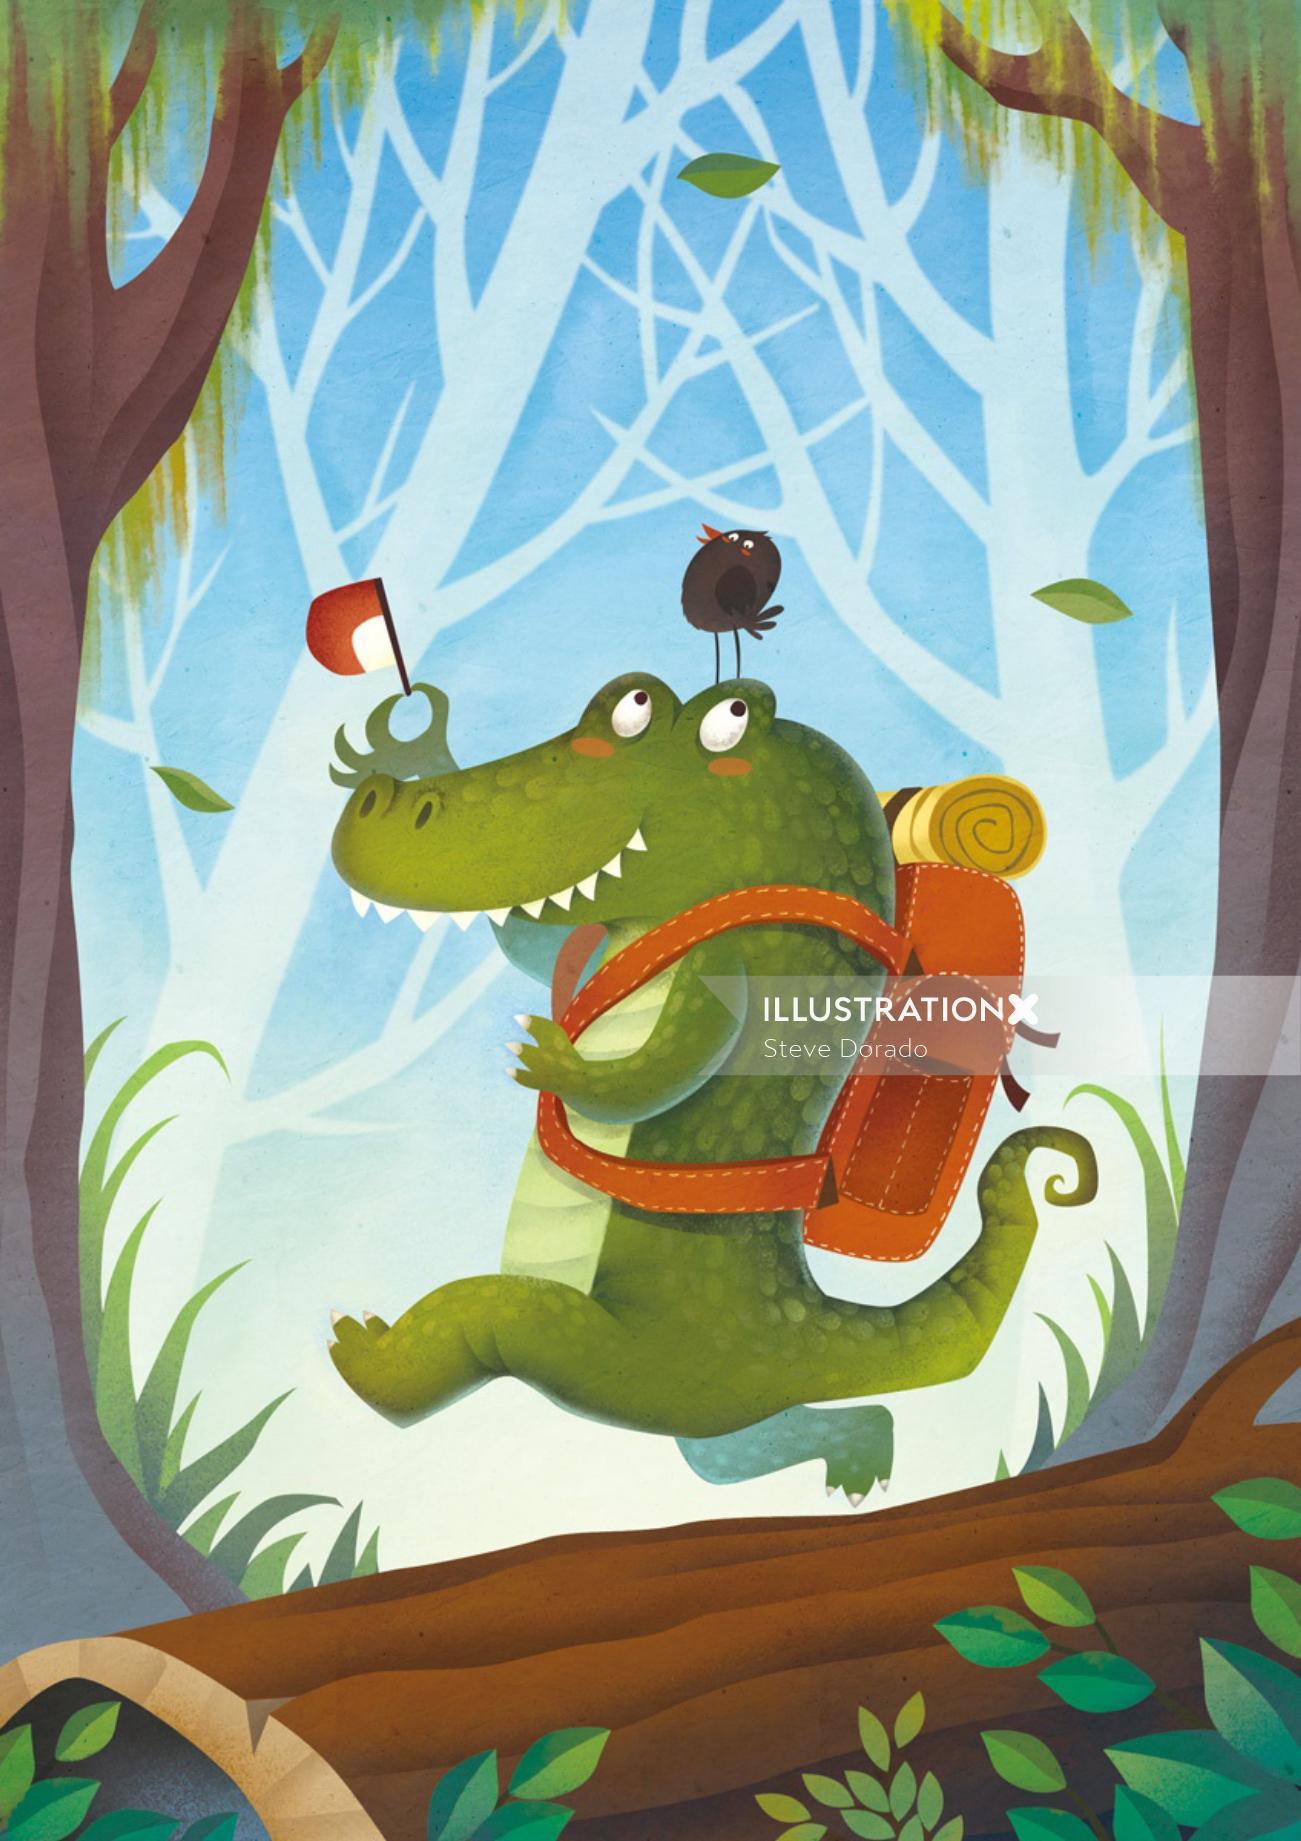 Comic crocodile illustration by Steve Dorado